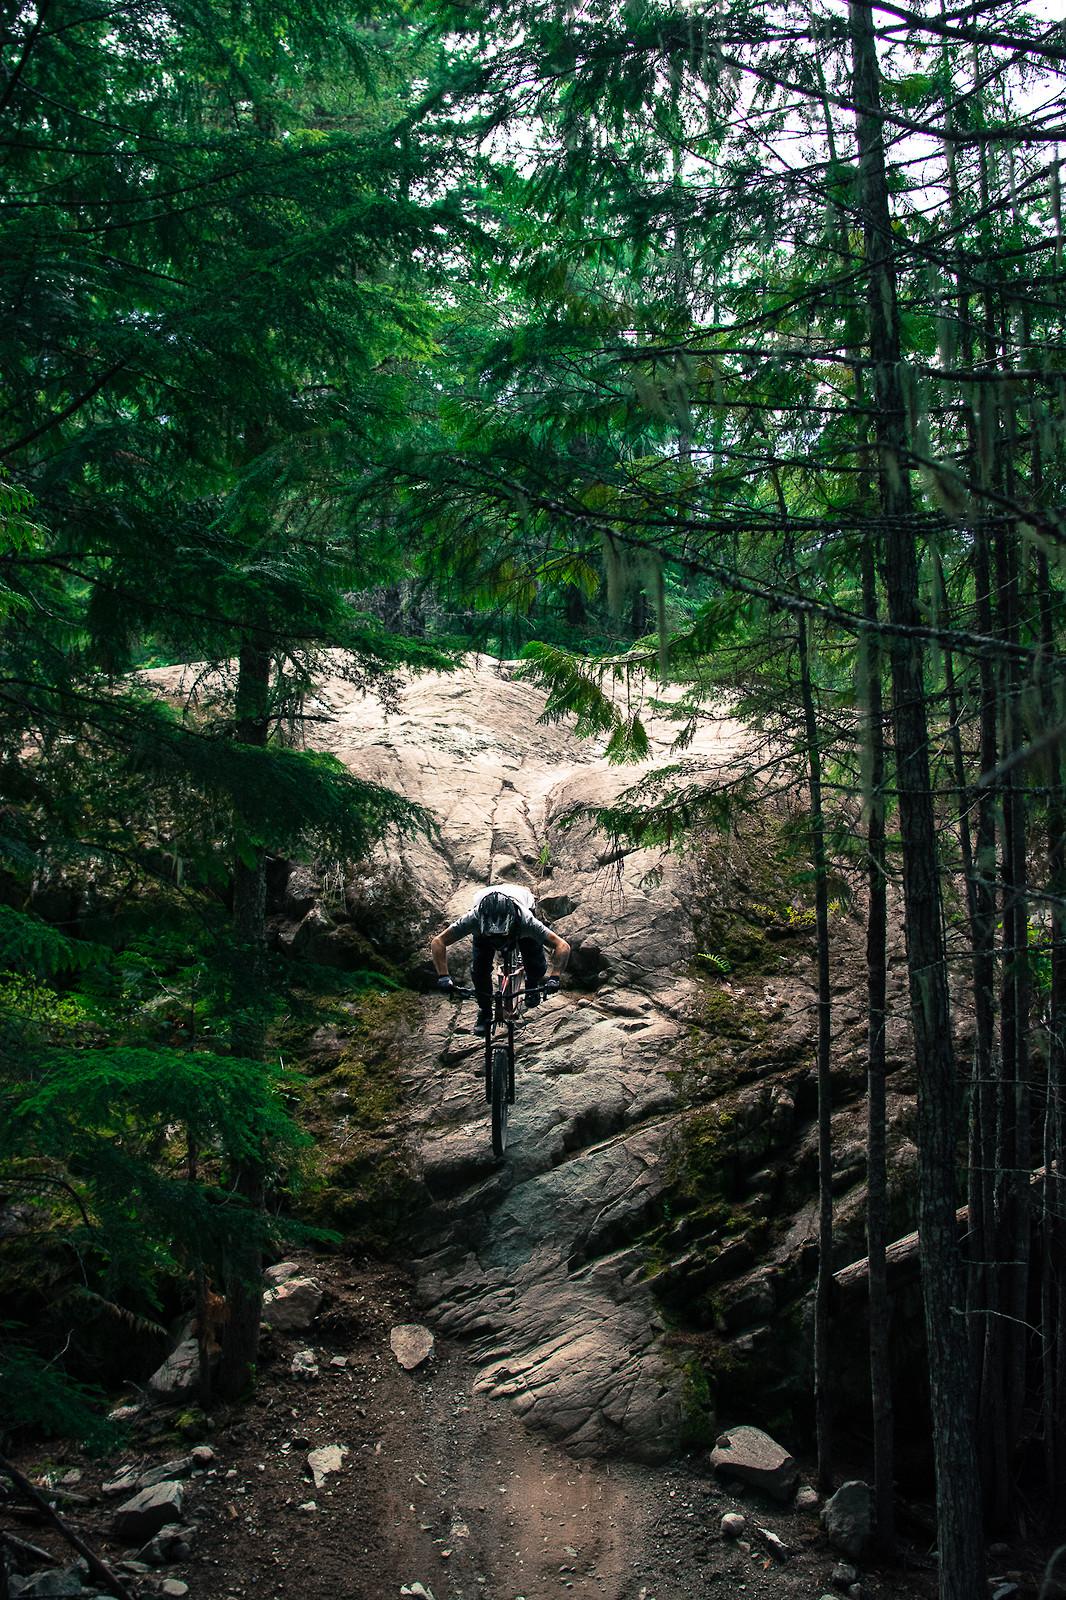 rock slave / Whistler Mountain Bike Park on hardtail - Banan - Mountain Biking Pictures - Vital MTB